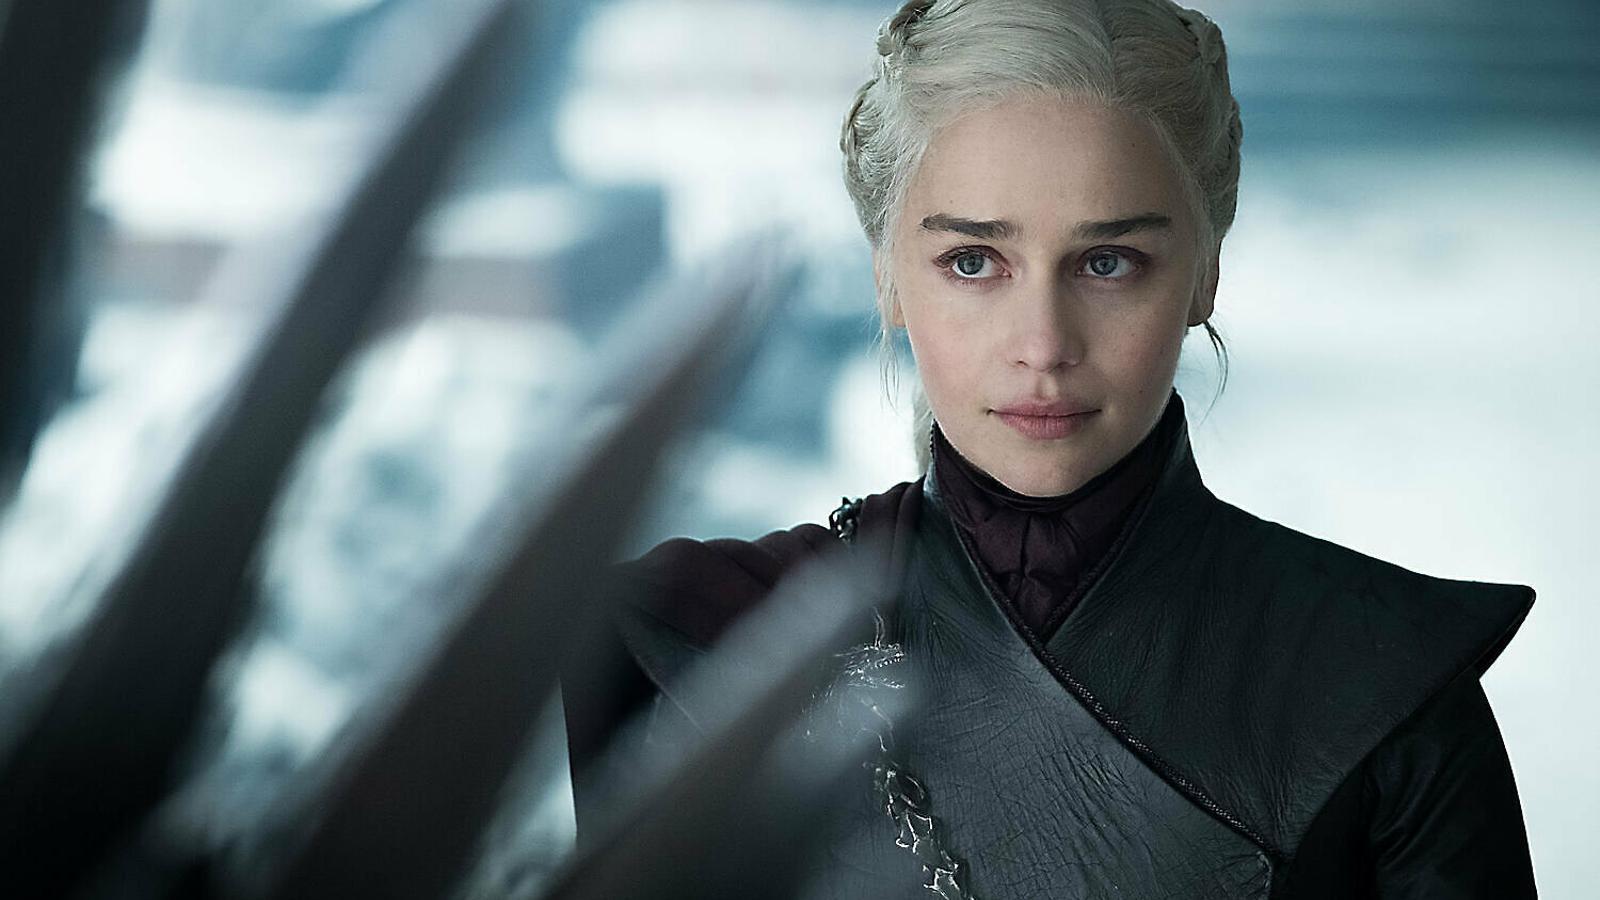 Daenerys Targaryen (Emilia Clarke) a l'últim capítol de Joc de trons.